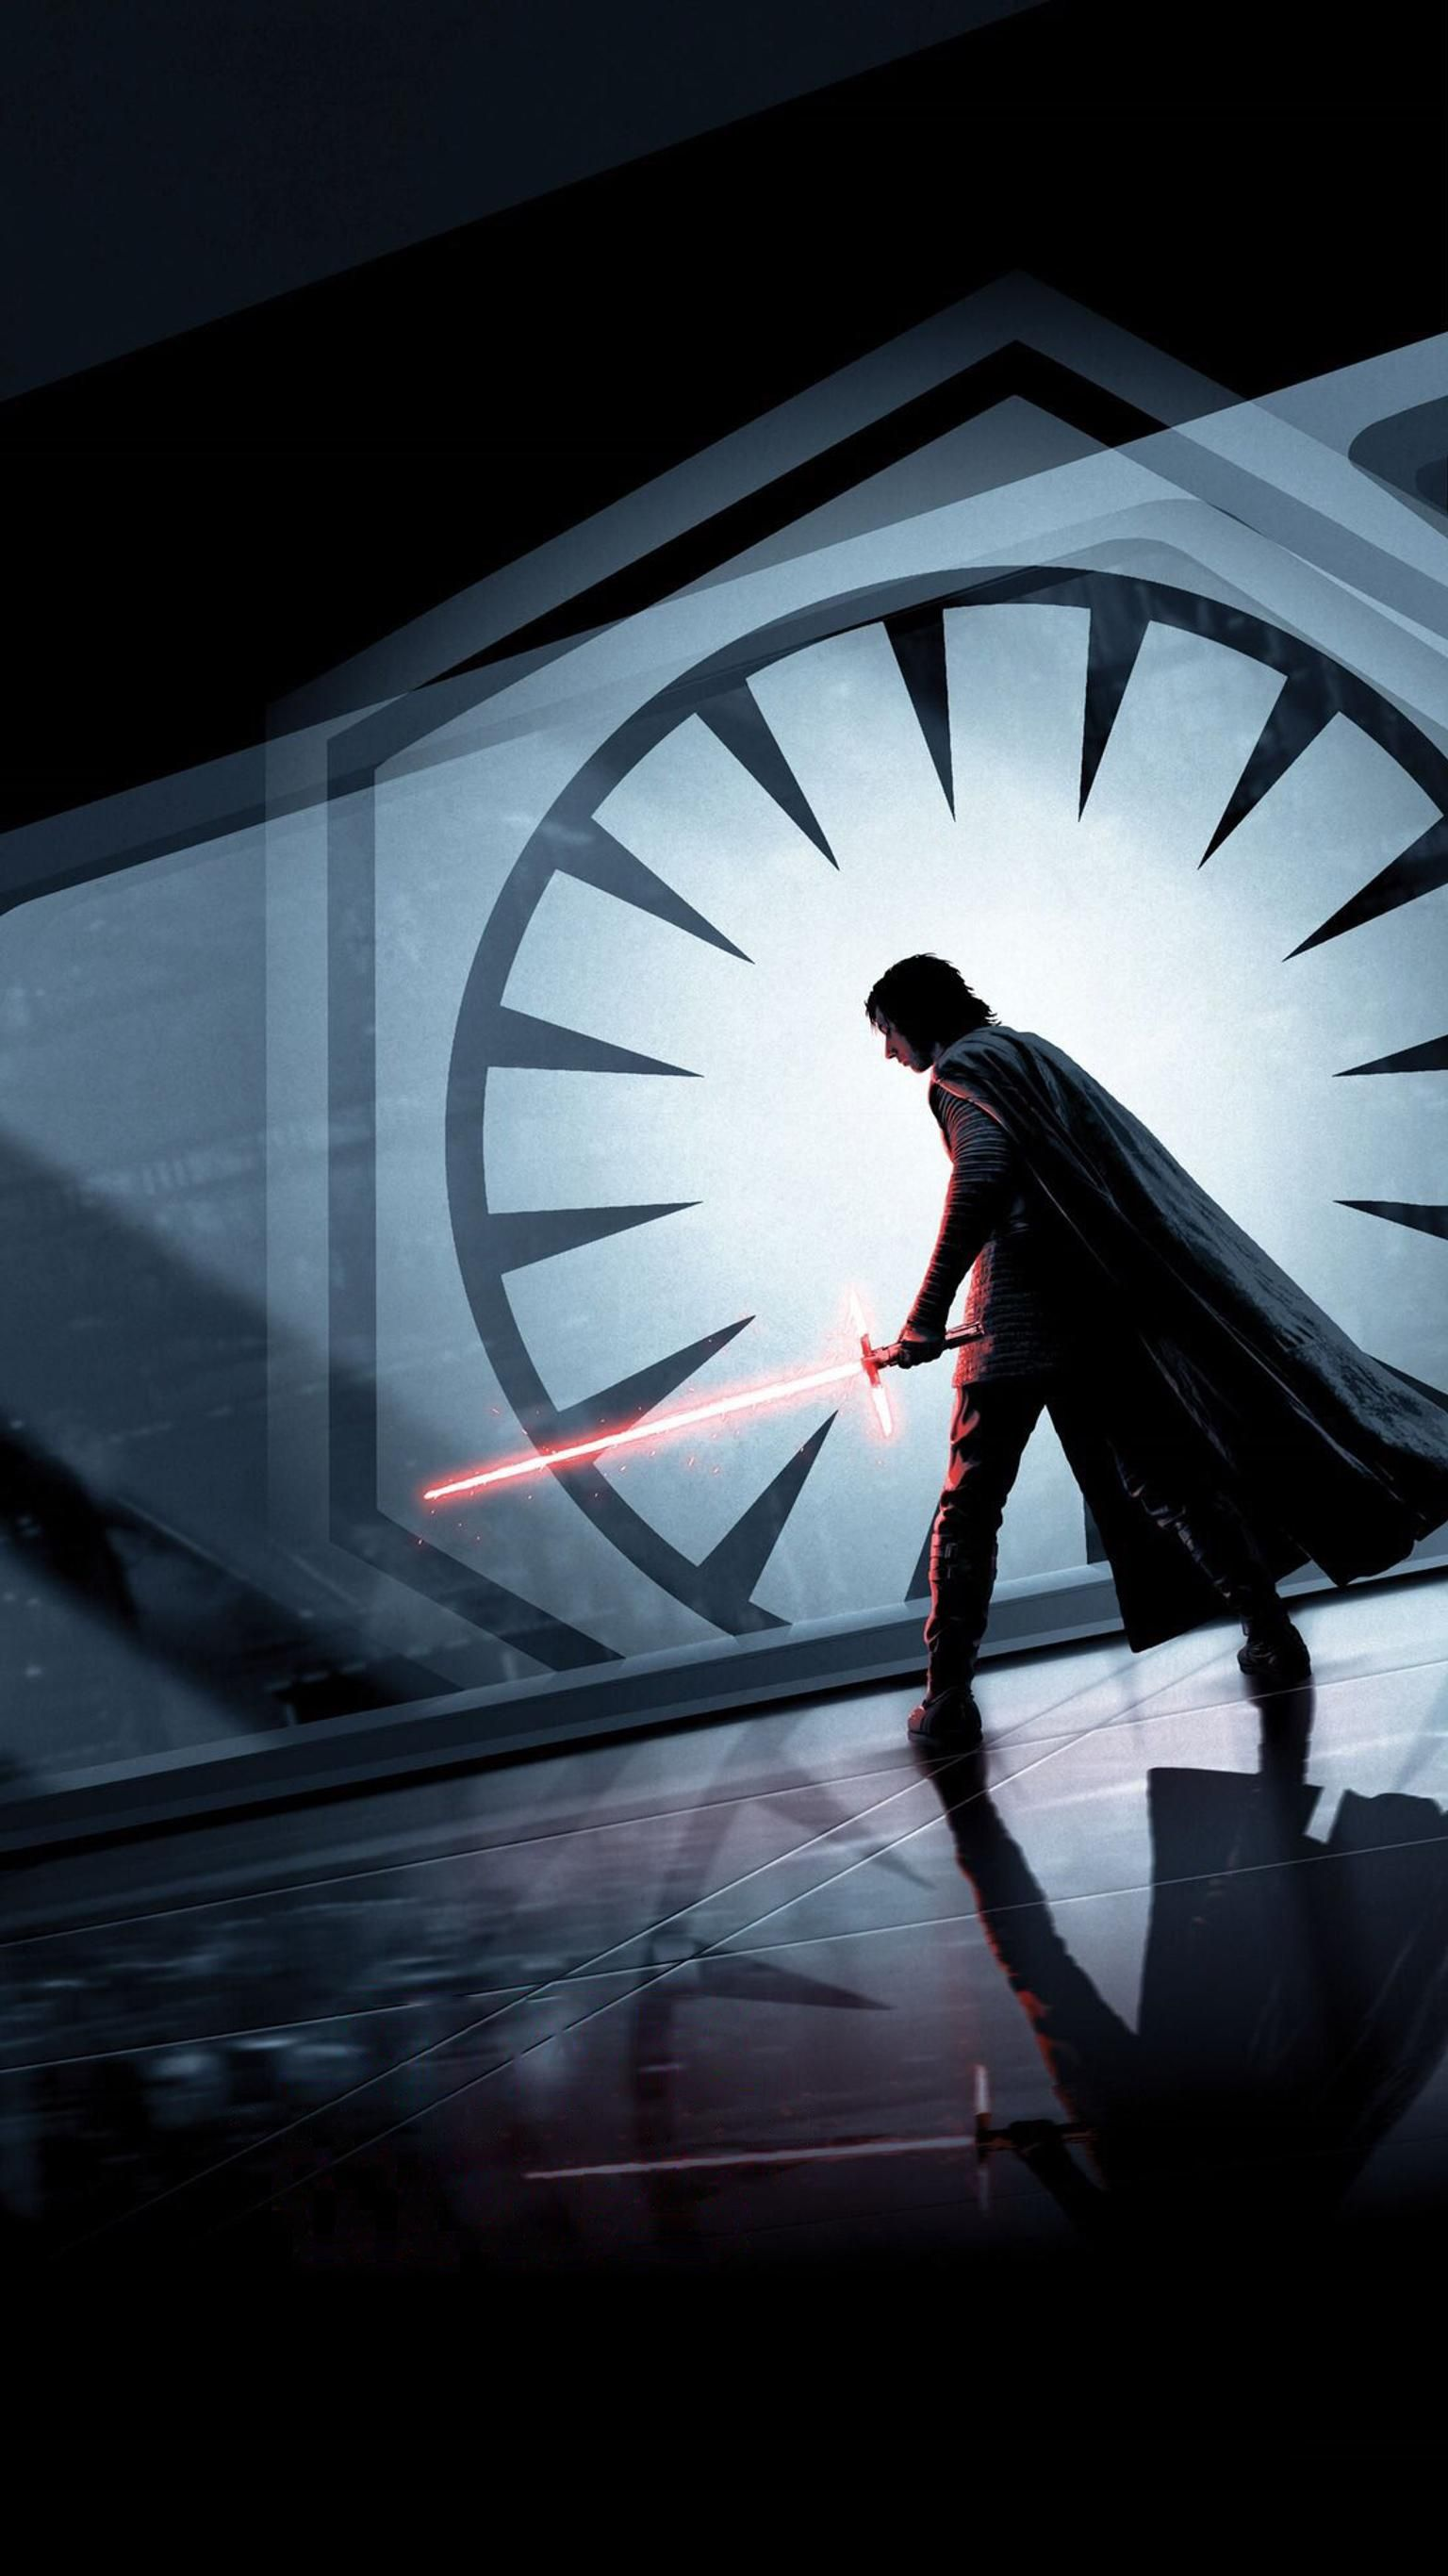 Moviemania Textless High Resolution Movie Wallpapers Star Wars Fandom Star Wars Awesome Star Wars Geek